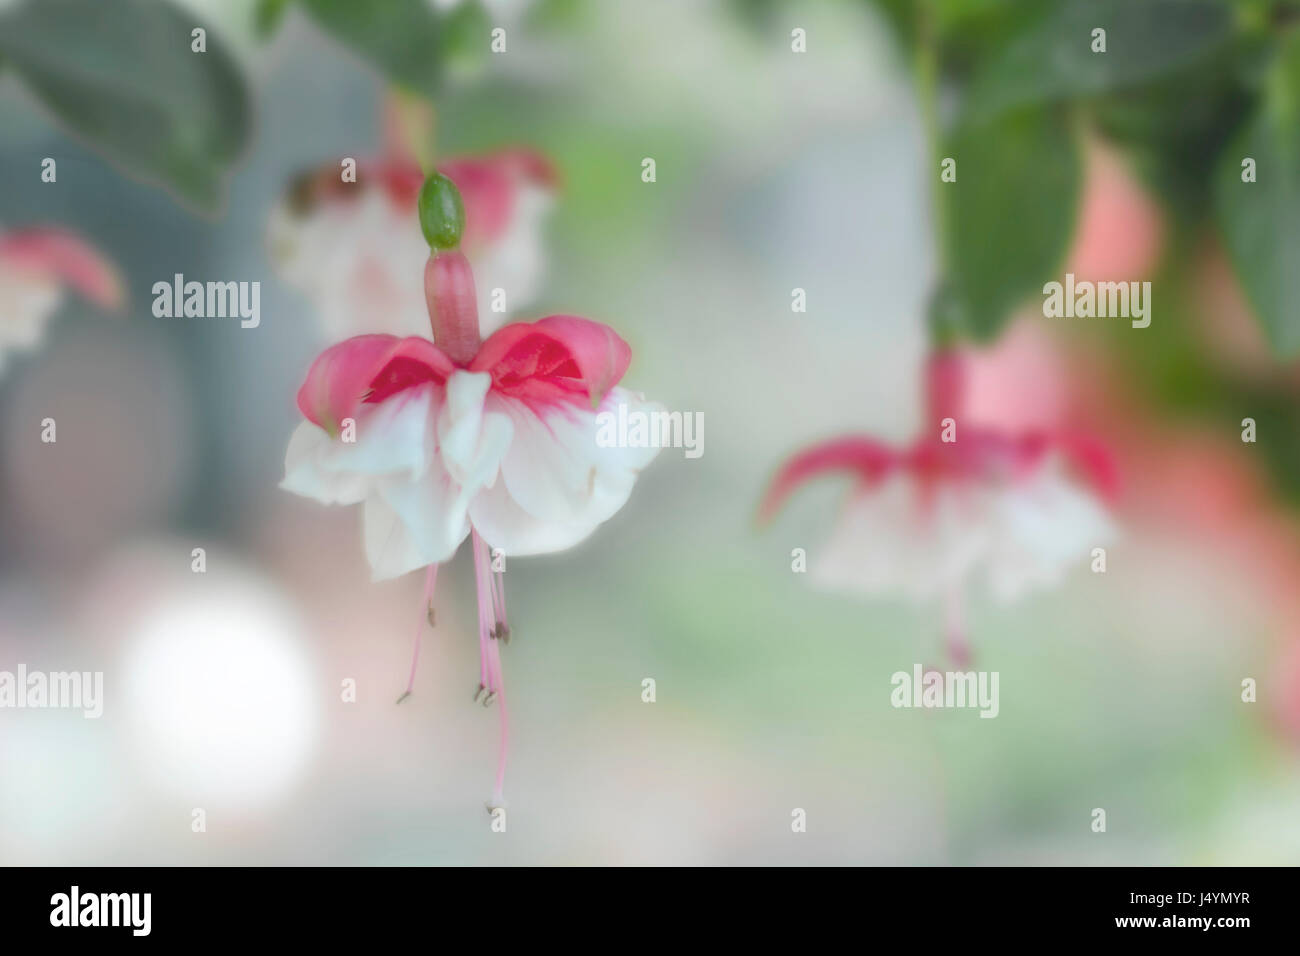 Hanging Fuchsia flowers - Stock Image